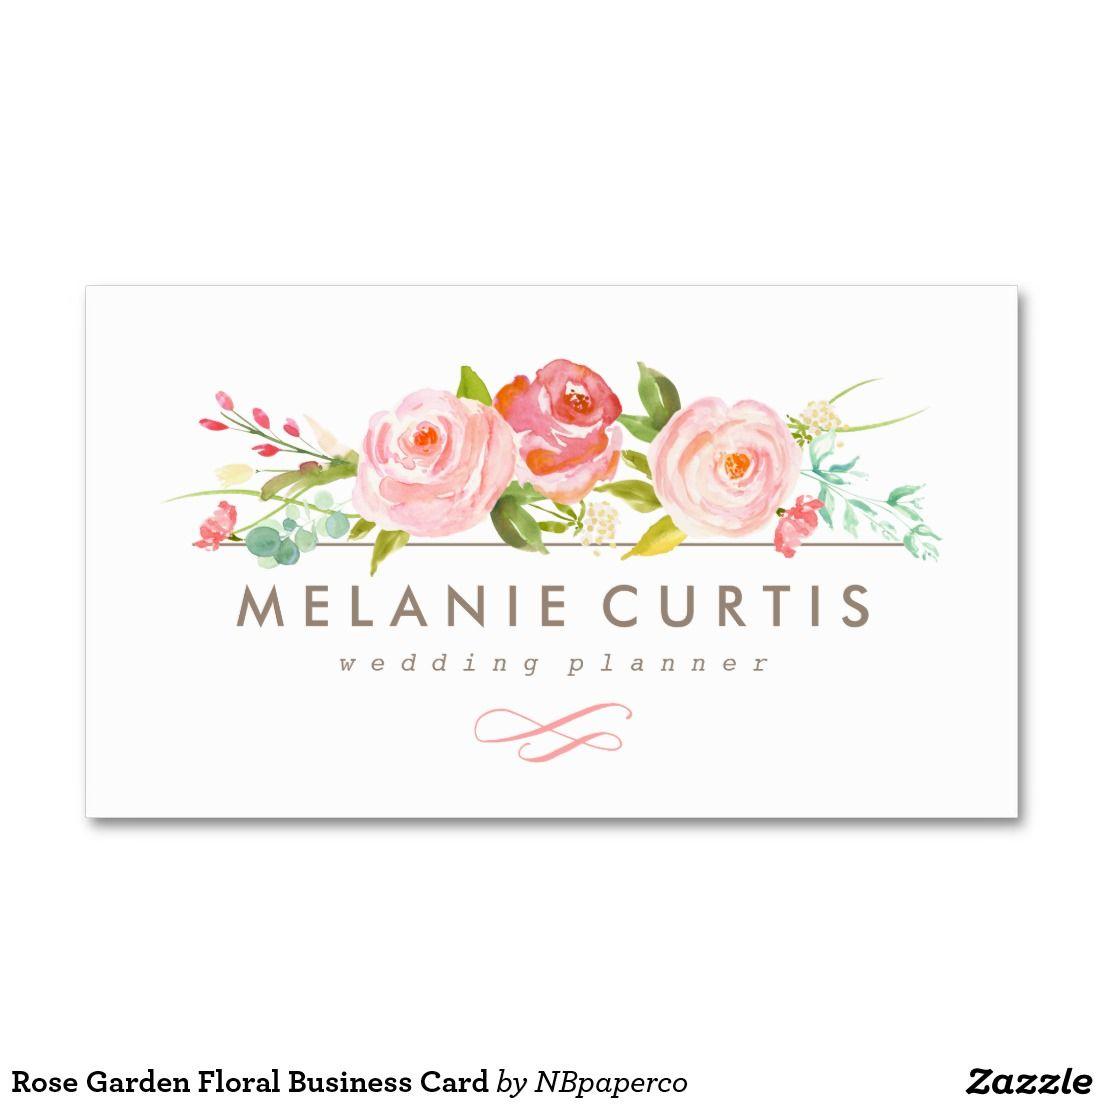 Rose Garden Floral Business Card | TARJETAS | Pinterest